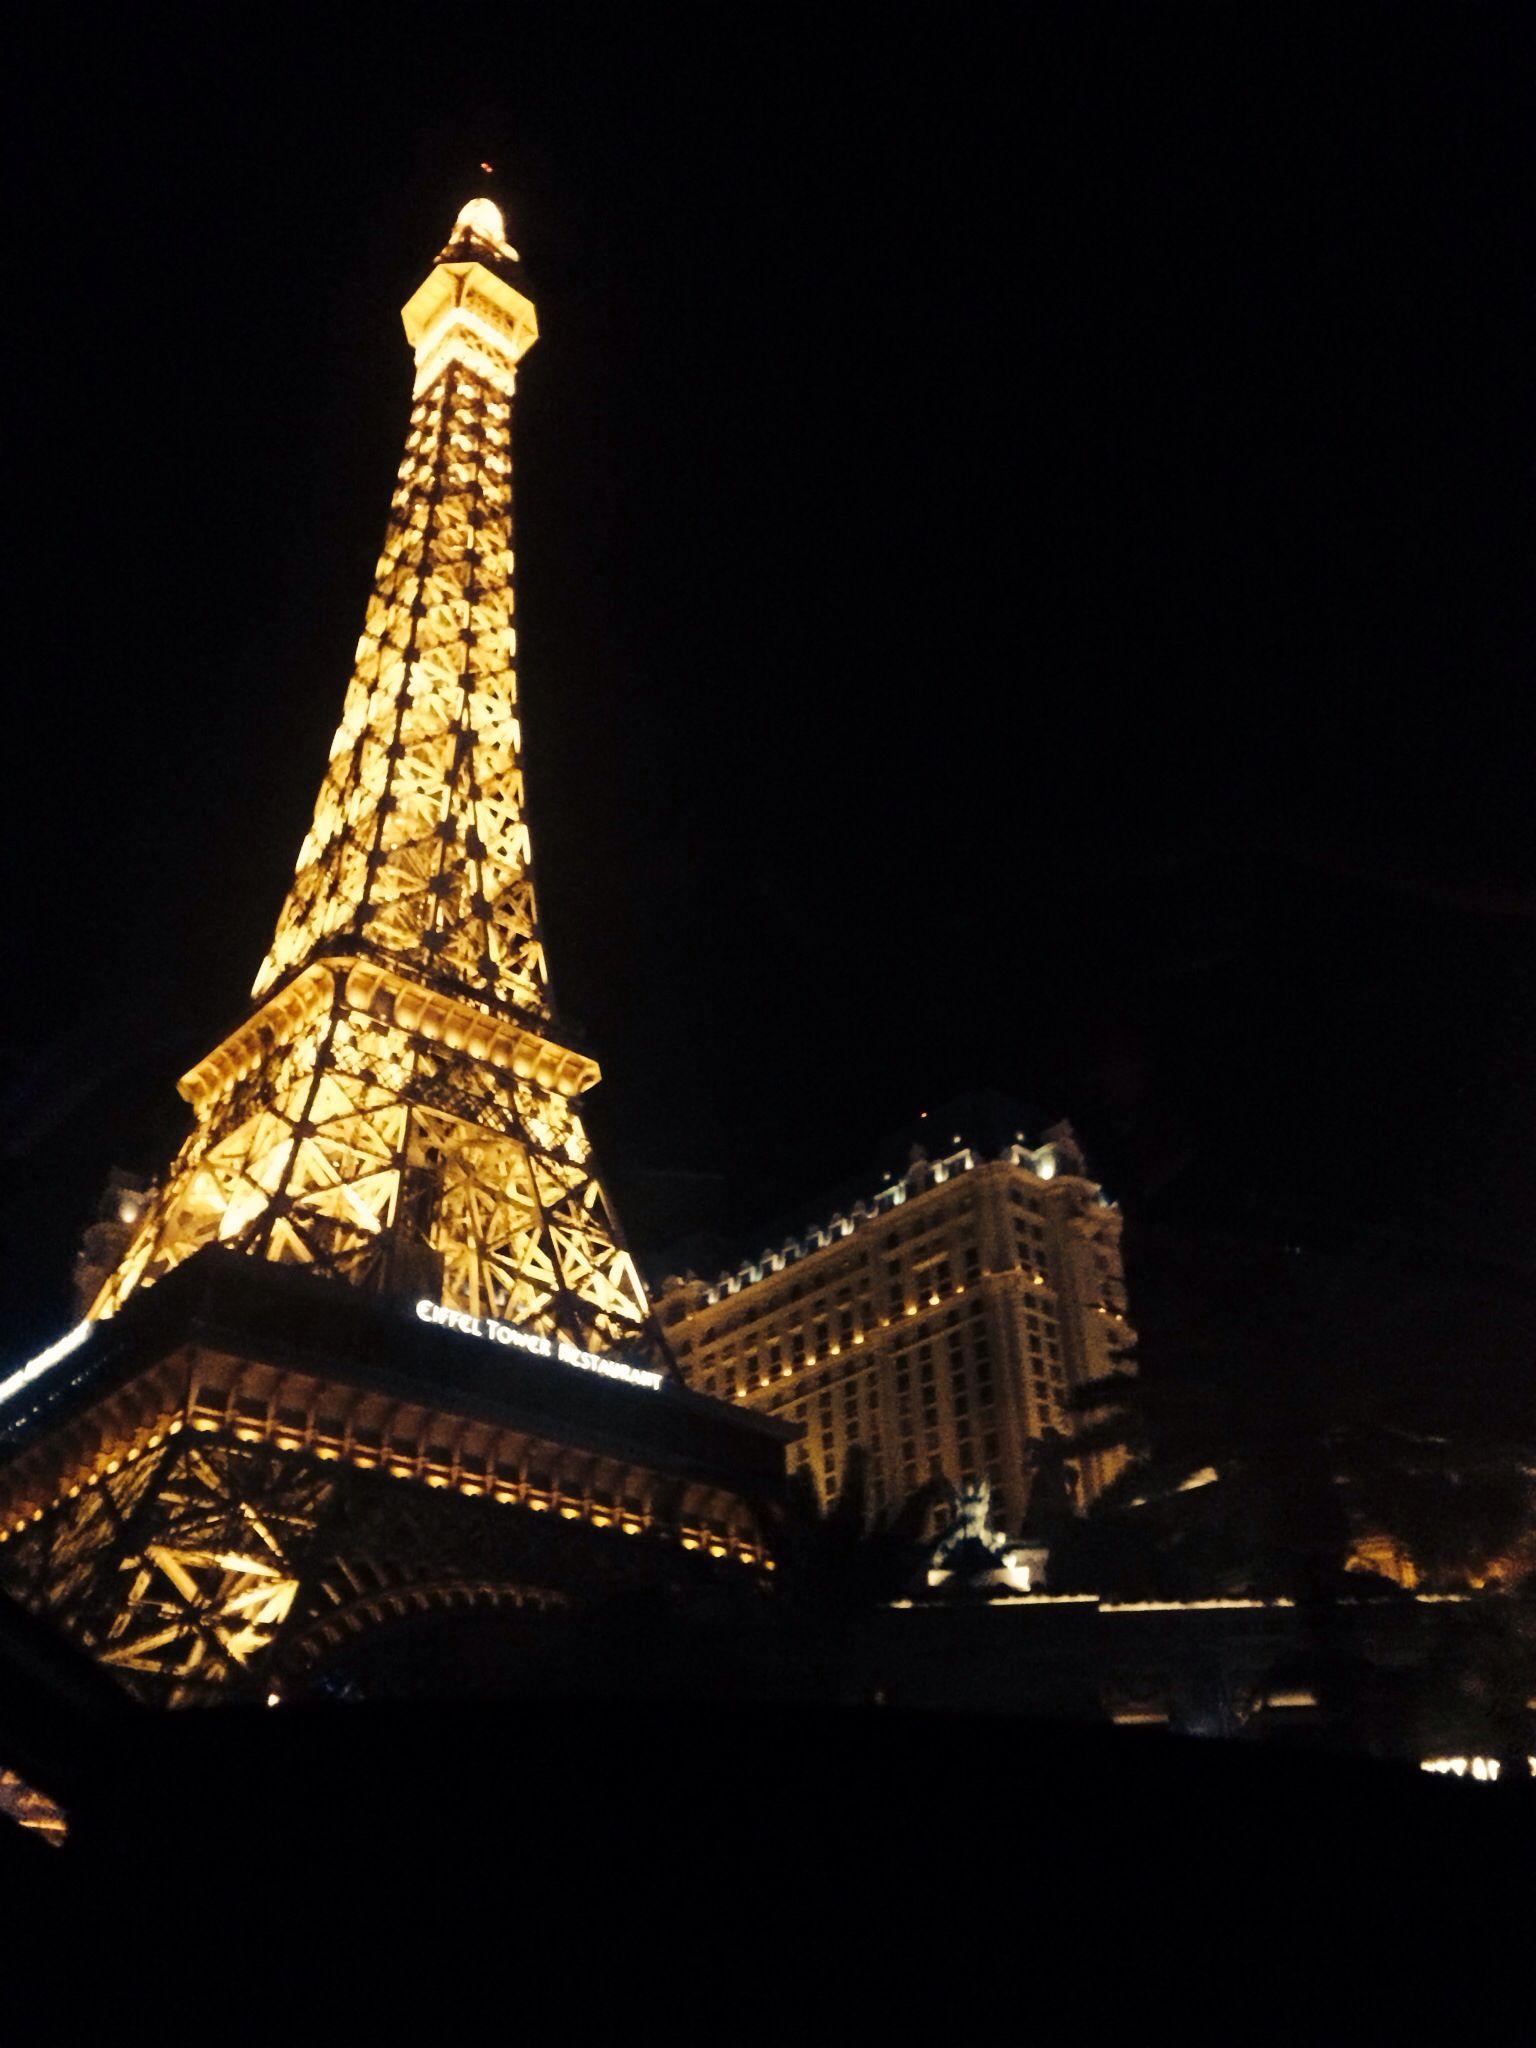 Paris Las Vegas Paris las vegas